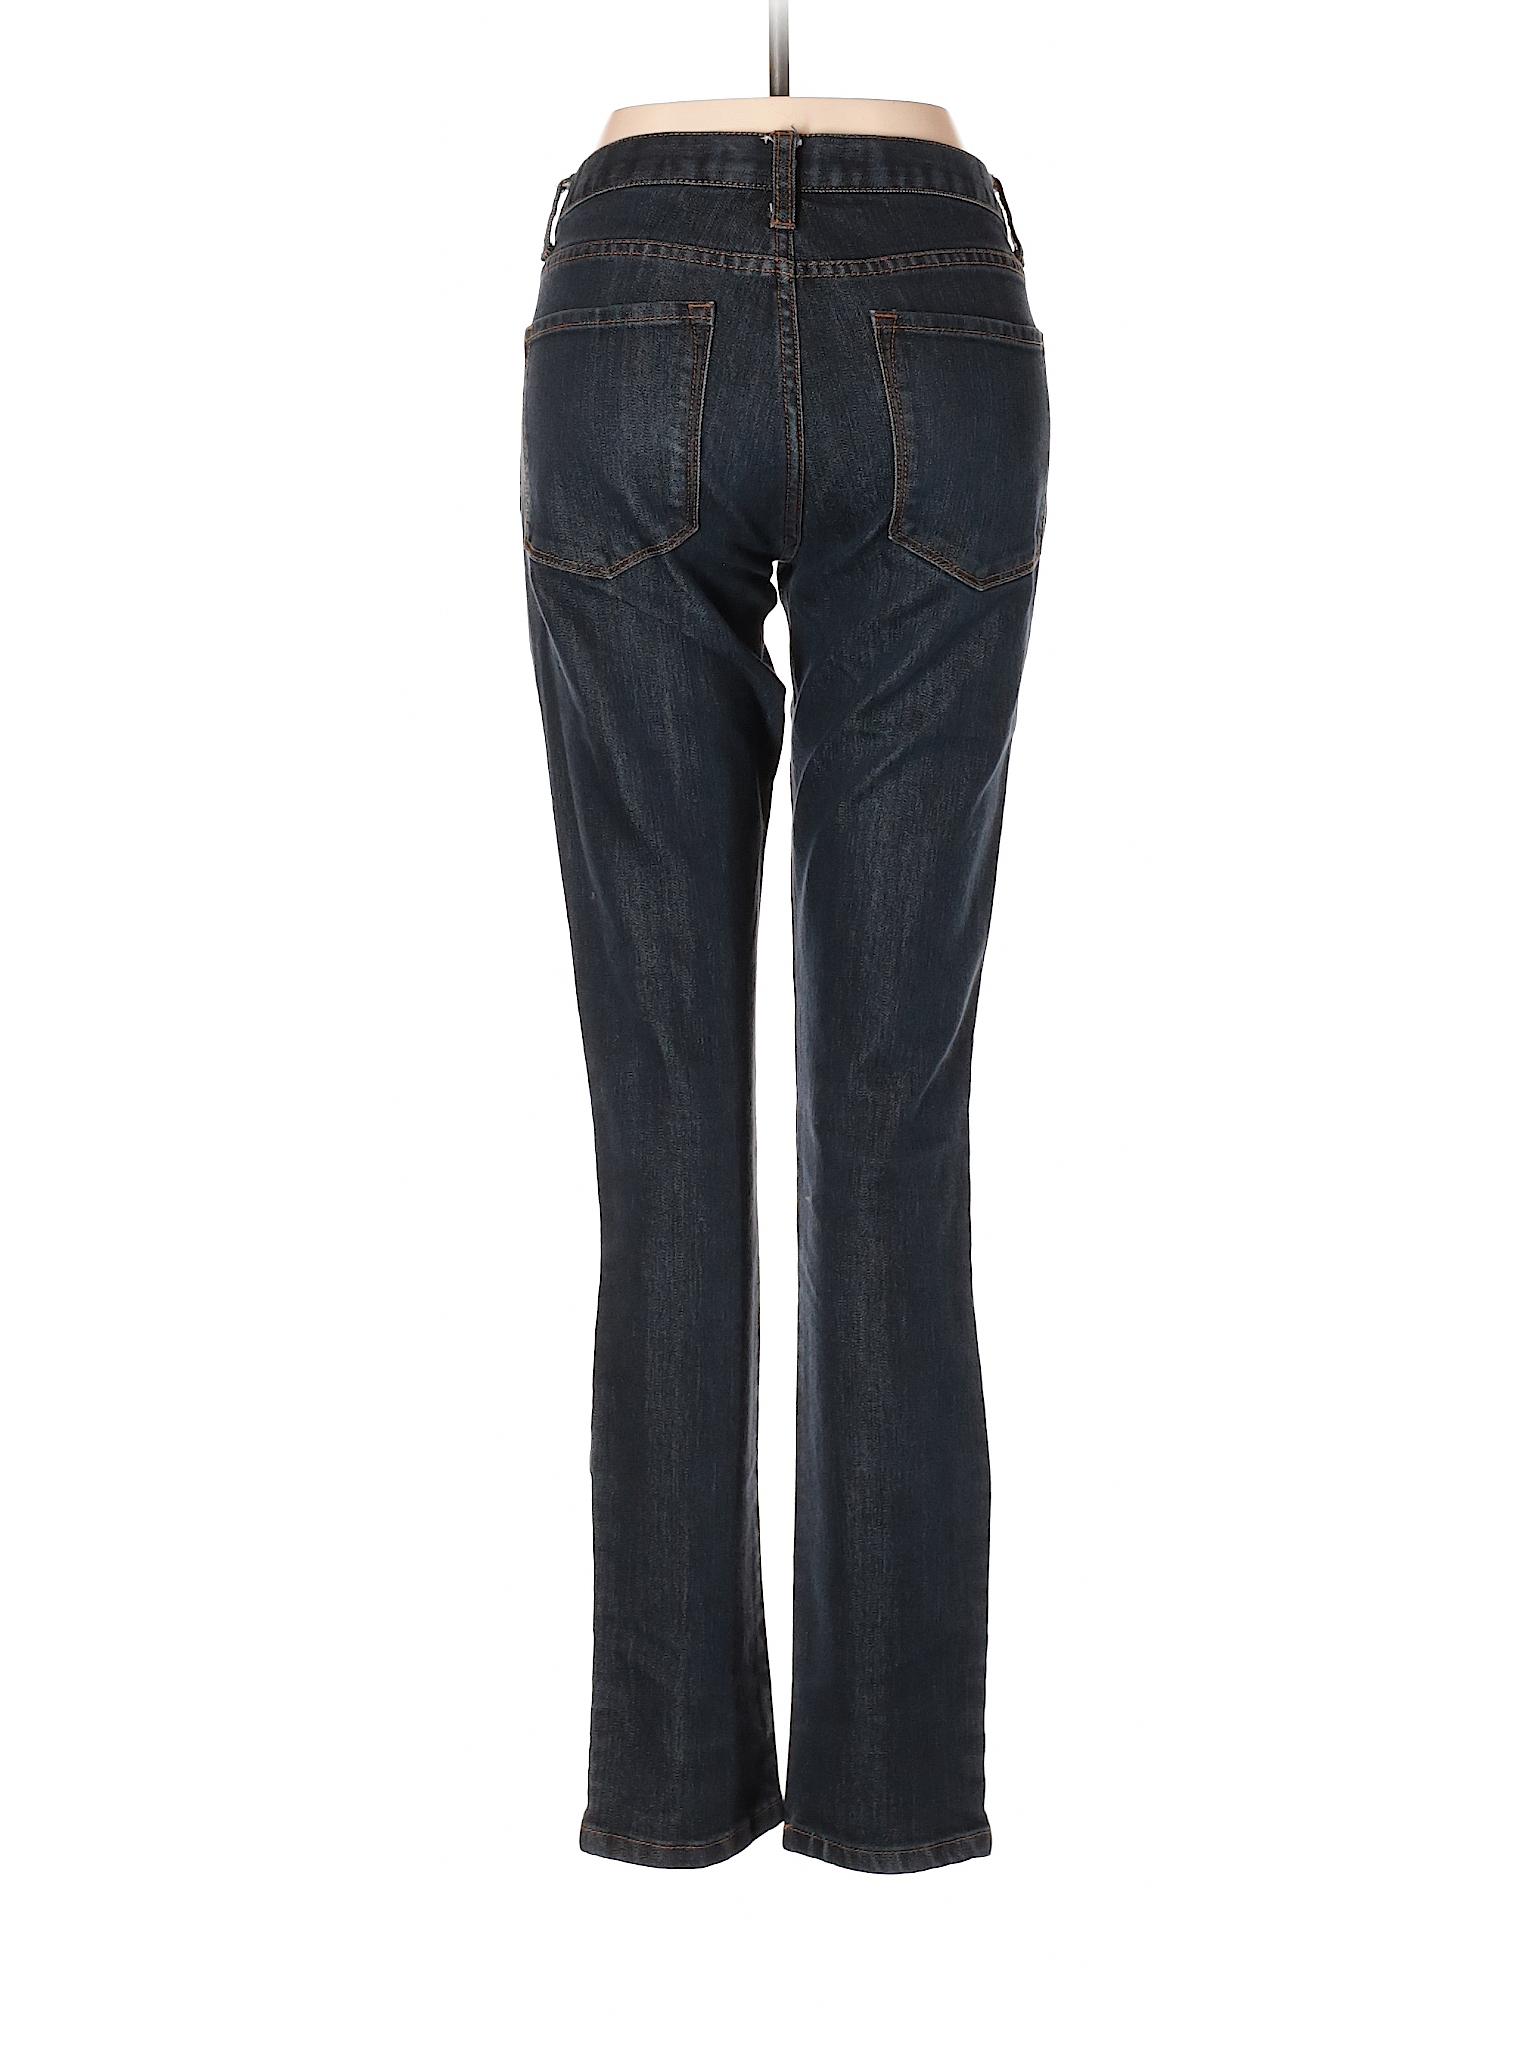 22a363be6ea1 Joe Fresh Solid Dark Blue Jeans Size 6 - 75% off | thredUP